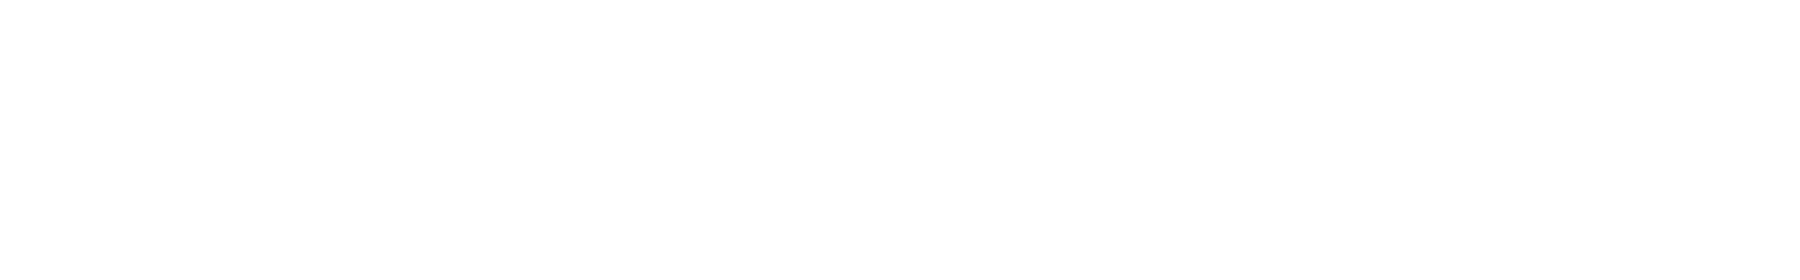 25 synth loop b